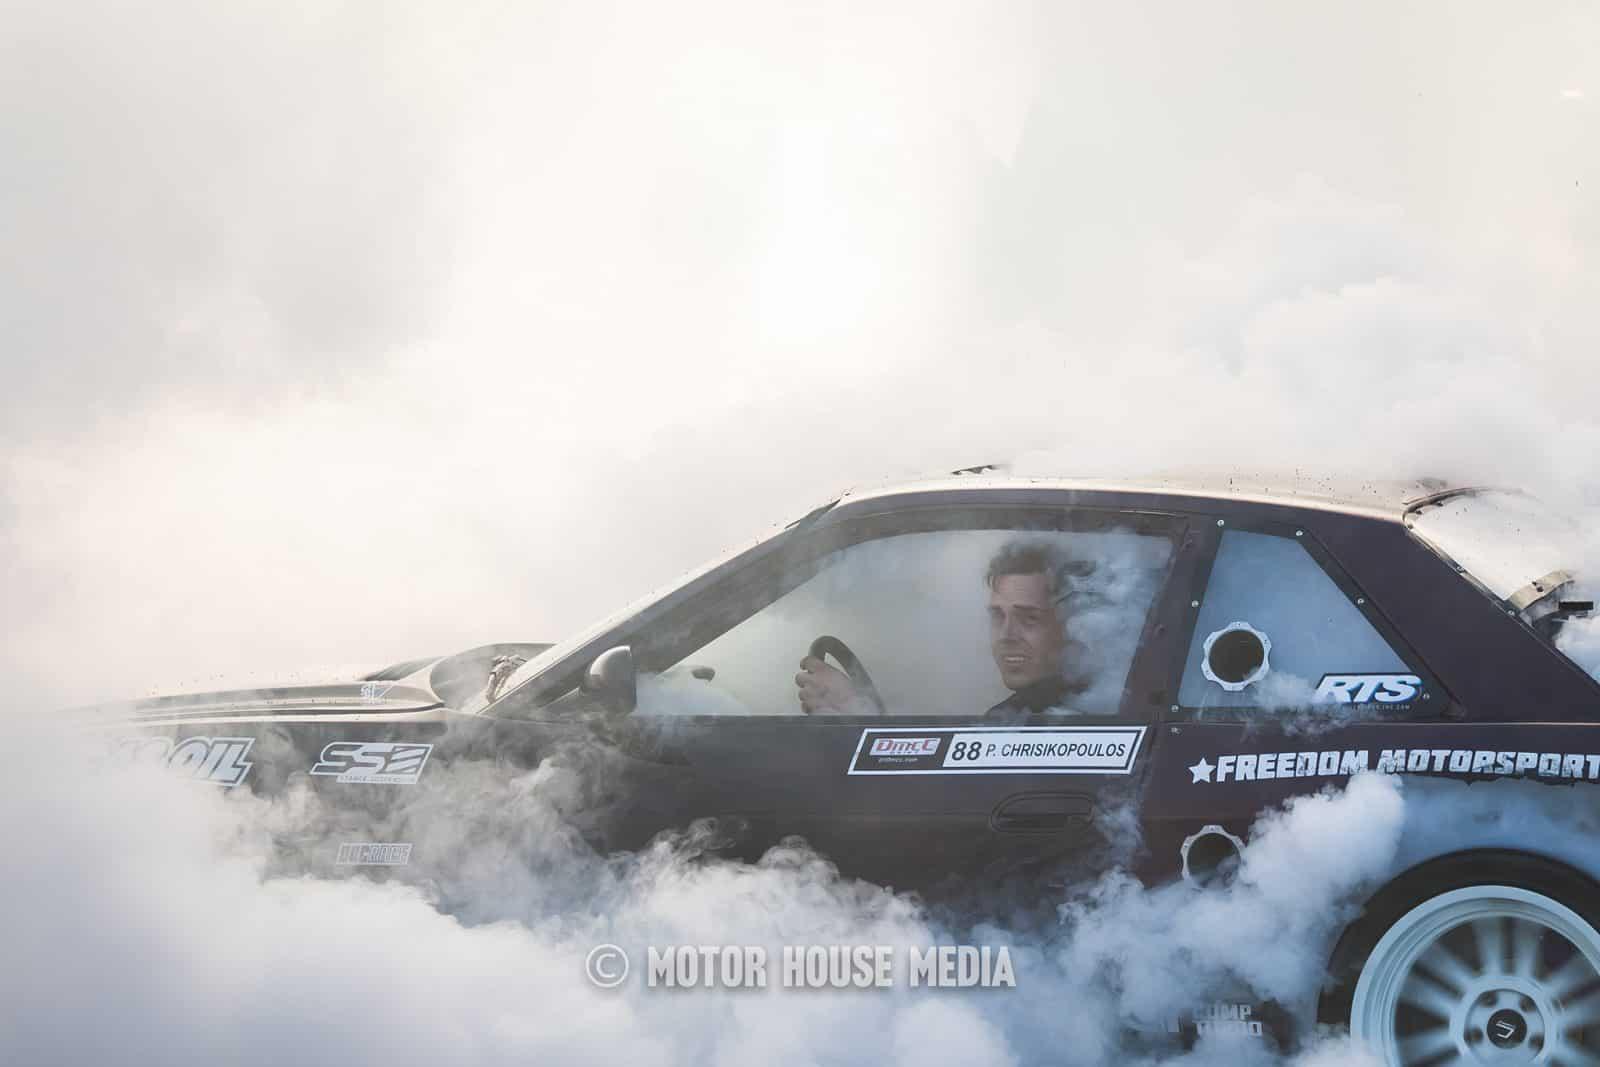 Peter Chrisikopoulos disappearing in tire smoke at the Hoonigan Sema Barnyard